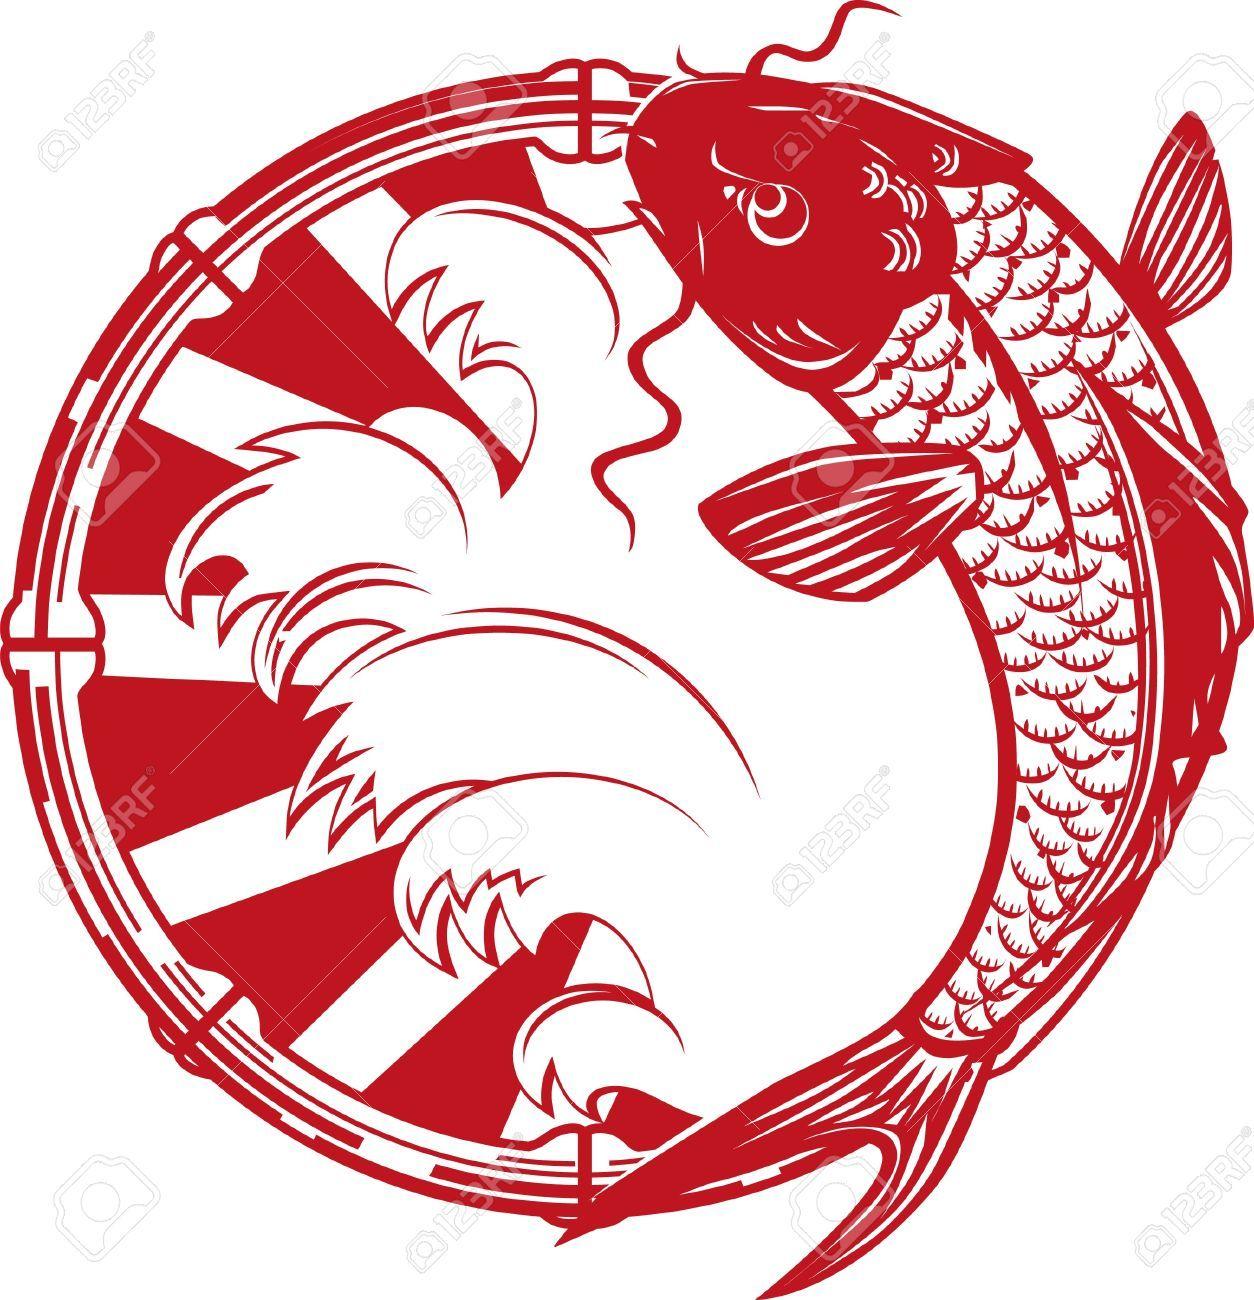 17443069-Koi-Emblem-Stock-Vector-koi-fish-carp.jpg (1254×1300 ...